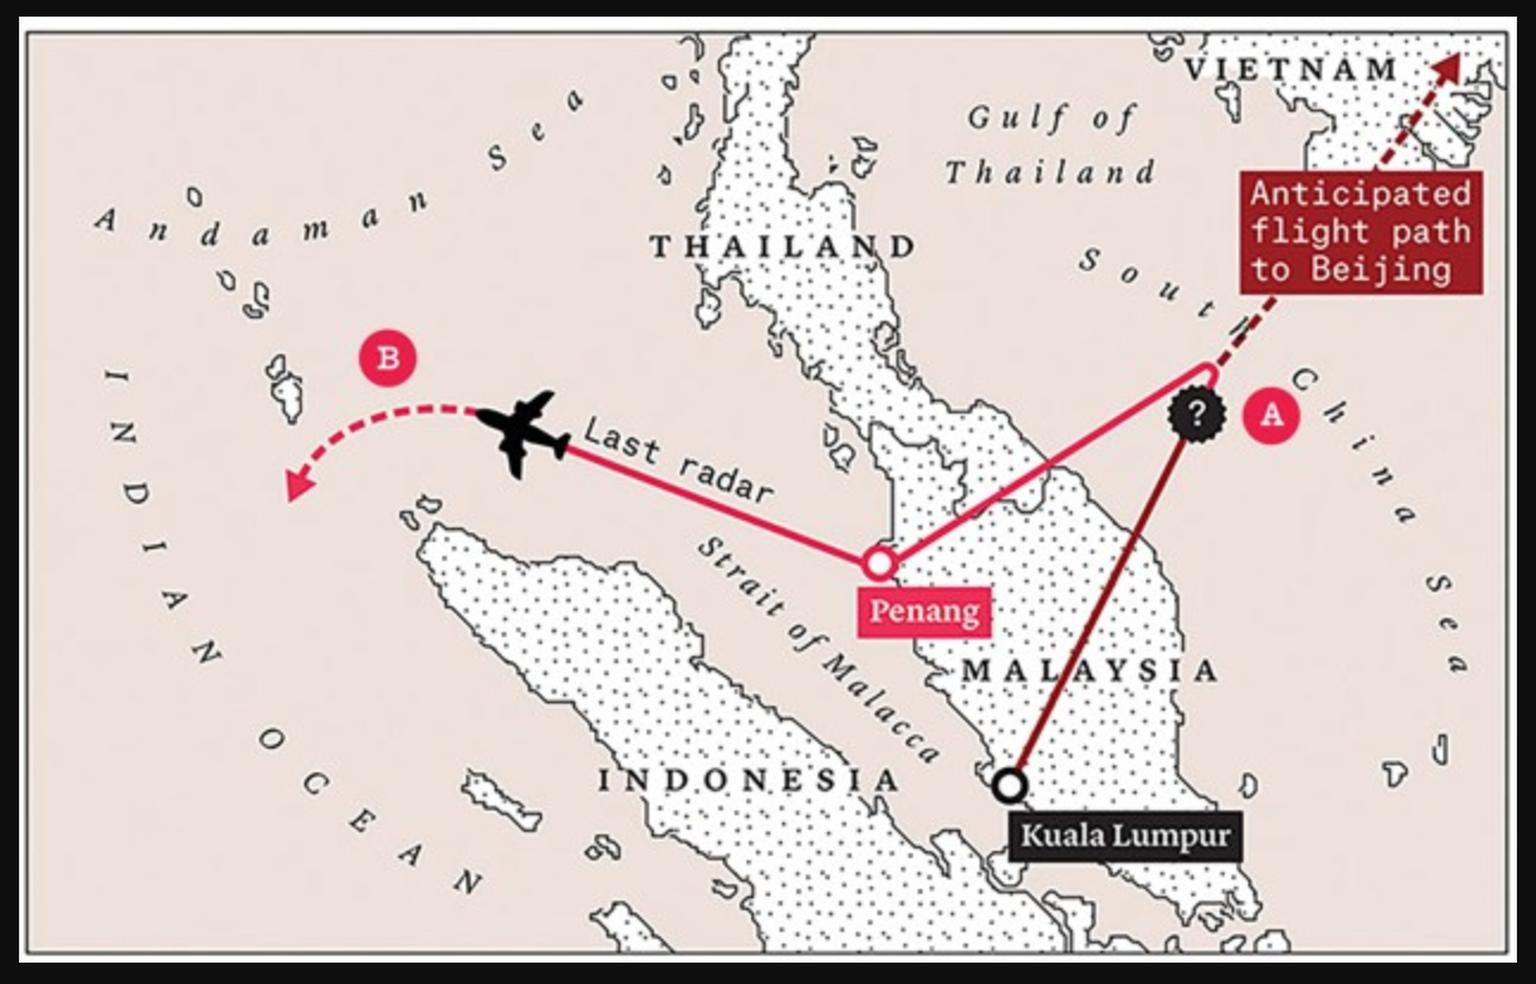 Flug MH370: Absturz der Malaysia Airlines ins Meer, alle ...